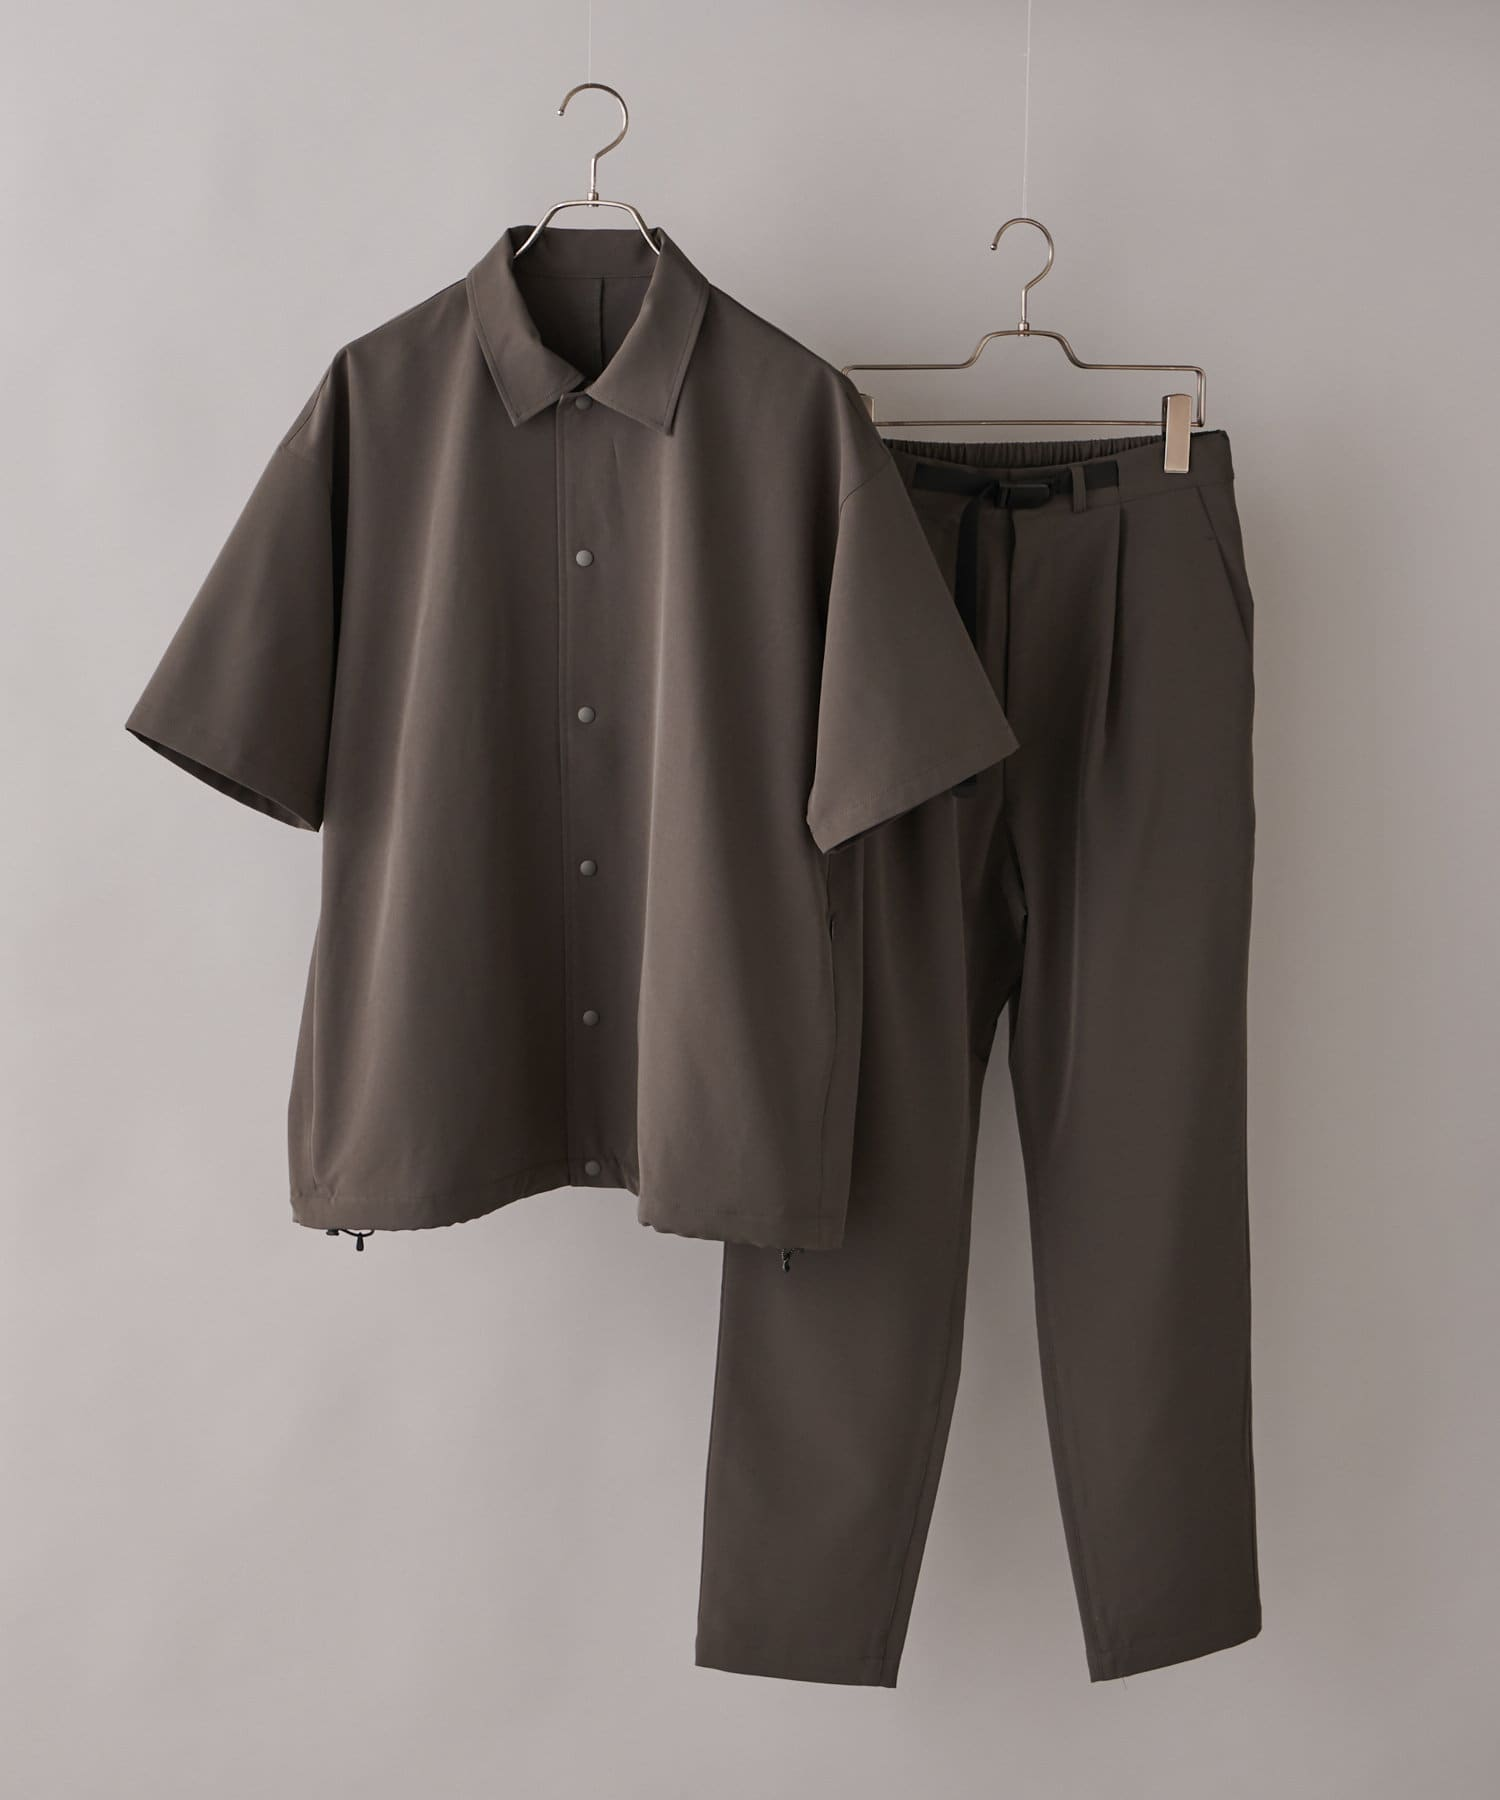 CIAOPANIC(チャオパニック) メンズ 【SHELTECH(R)/シェルテック】スナップシャツセットアップ グレー